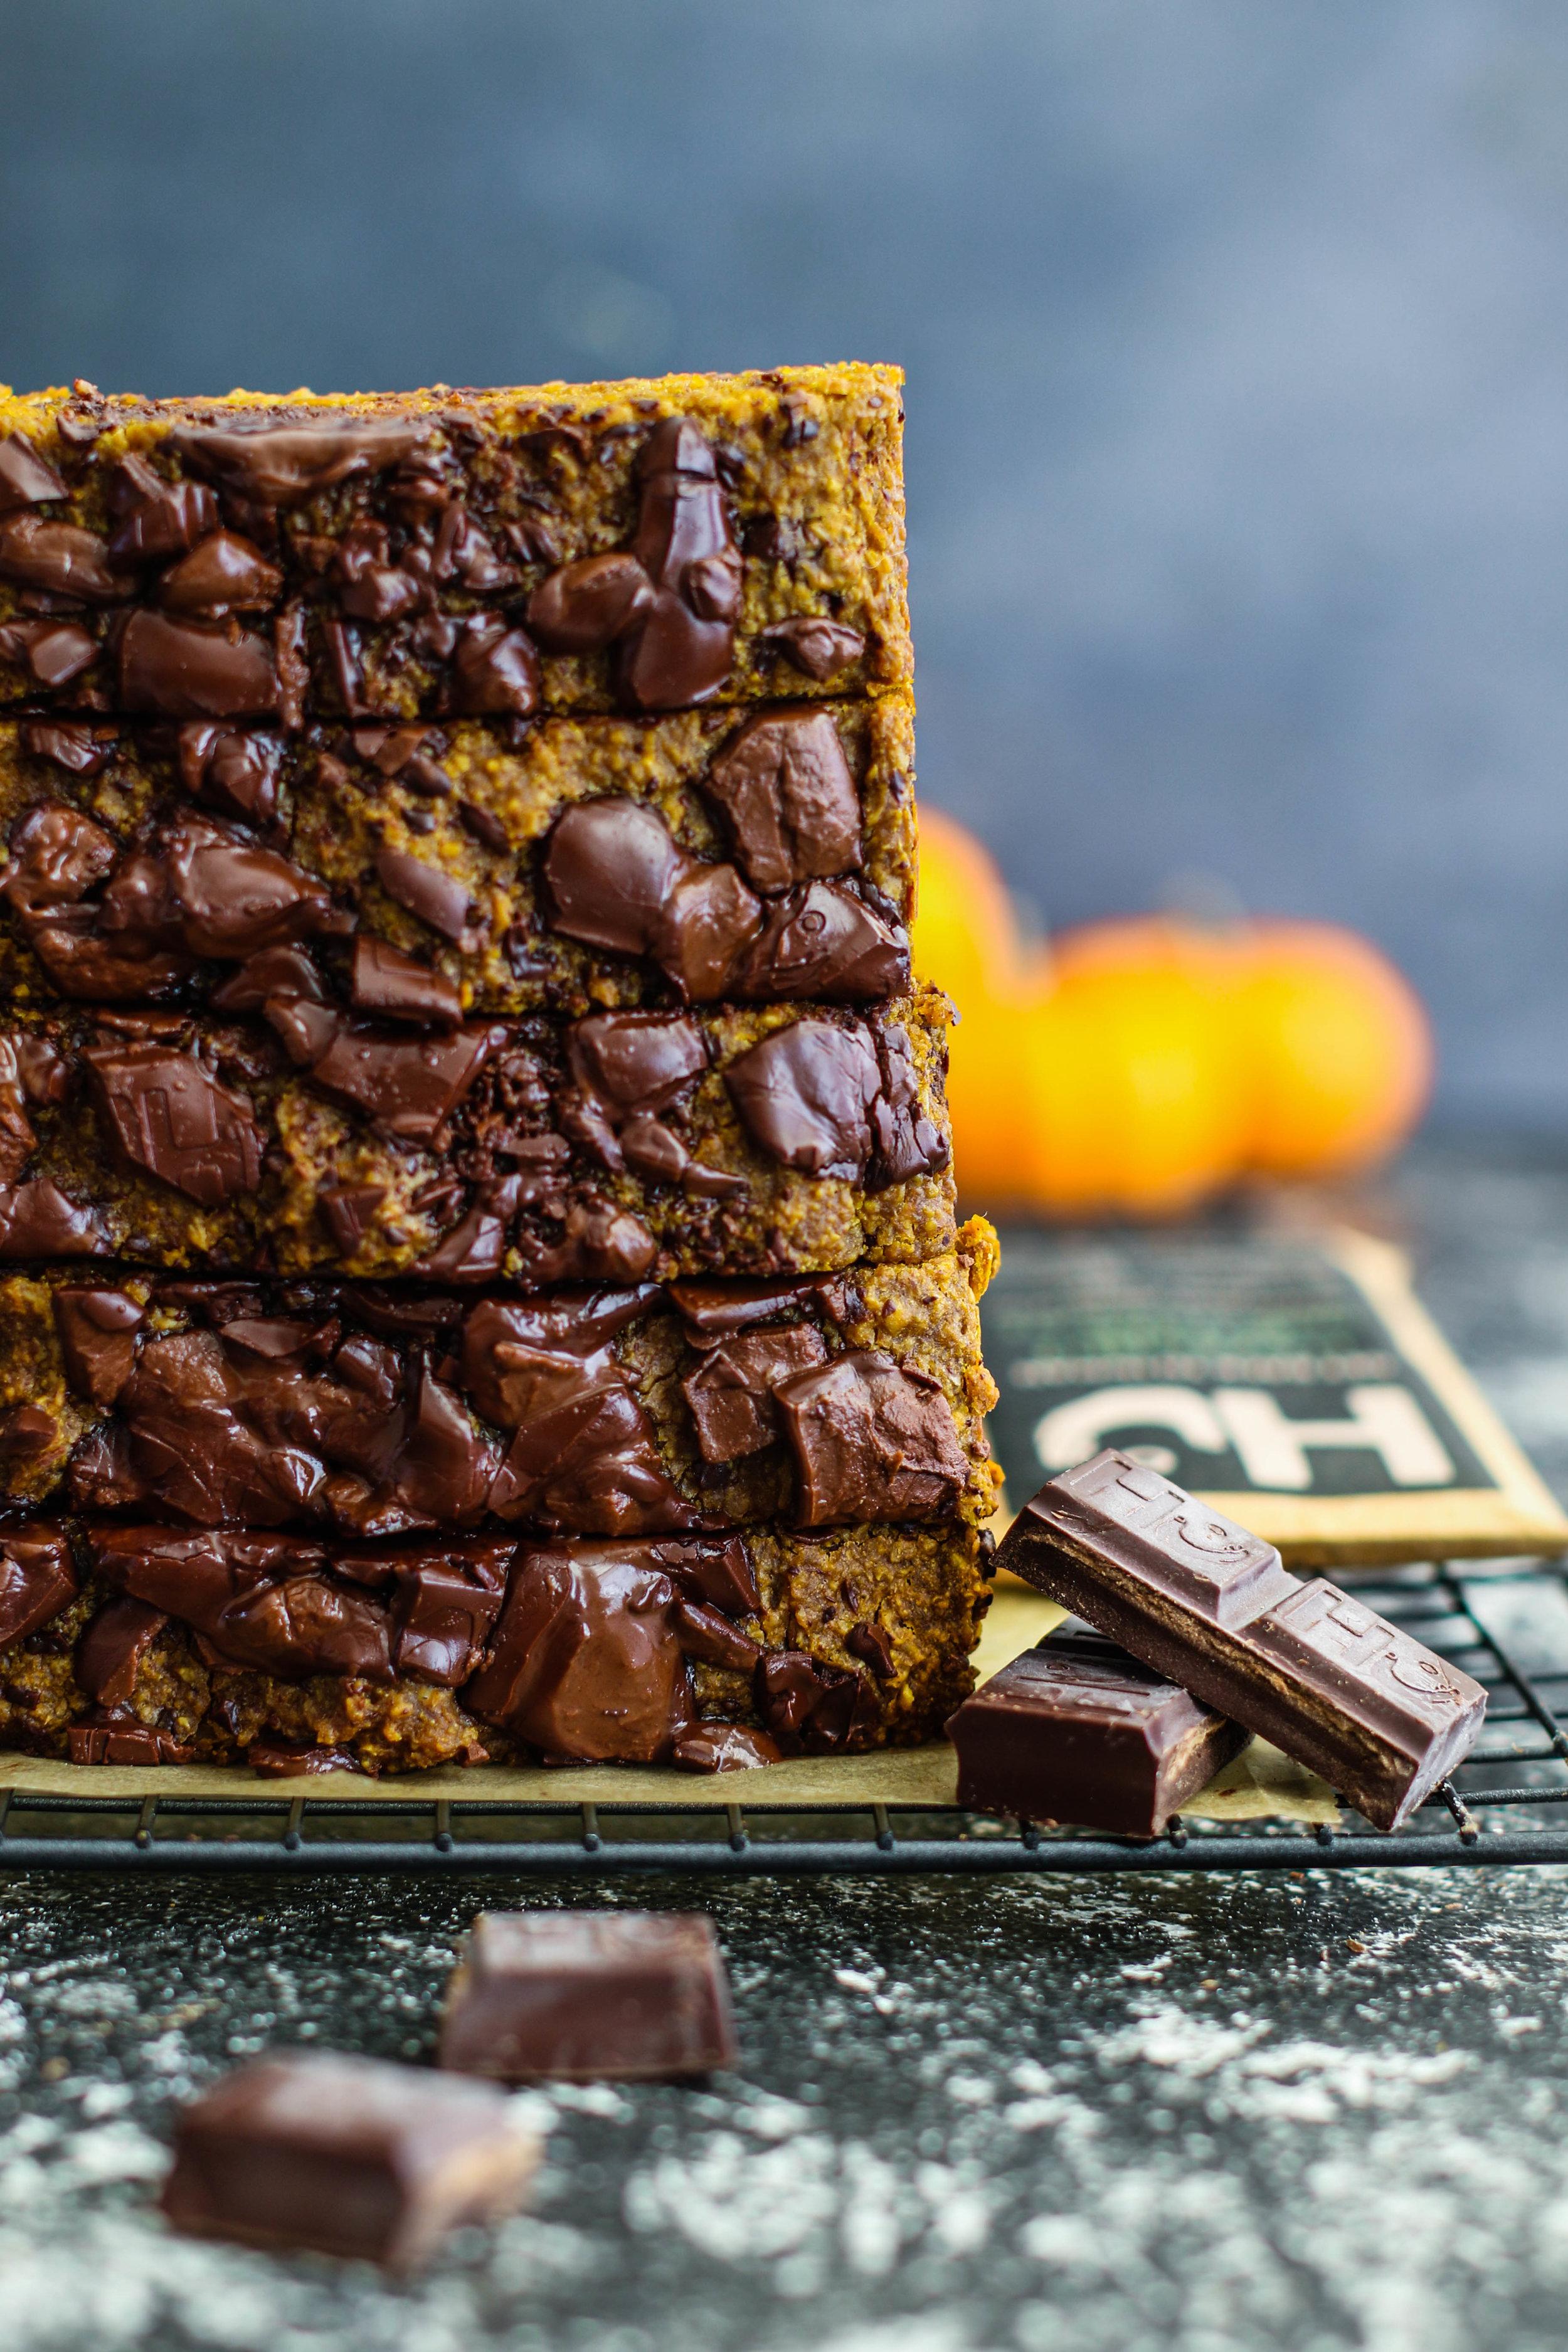 Hu-Chocolate-Vegan-Gluten-Free-Pumpkin-Chocolate-Chunk-Bread-1.jpg